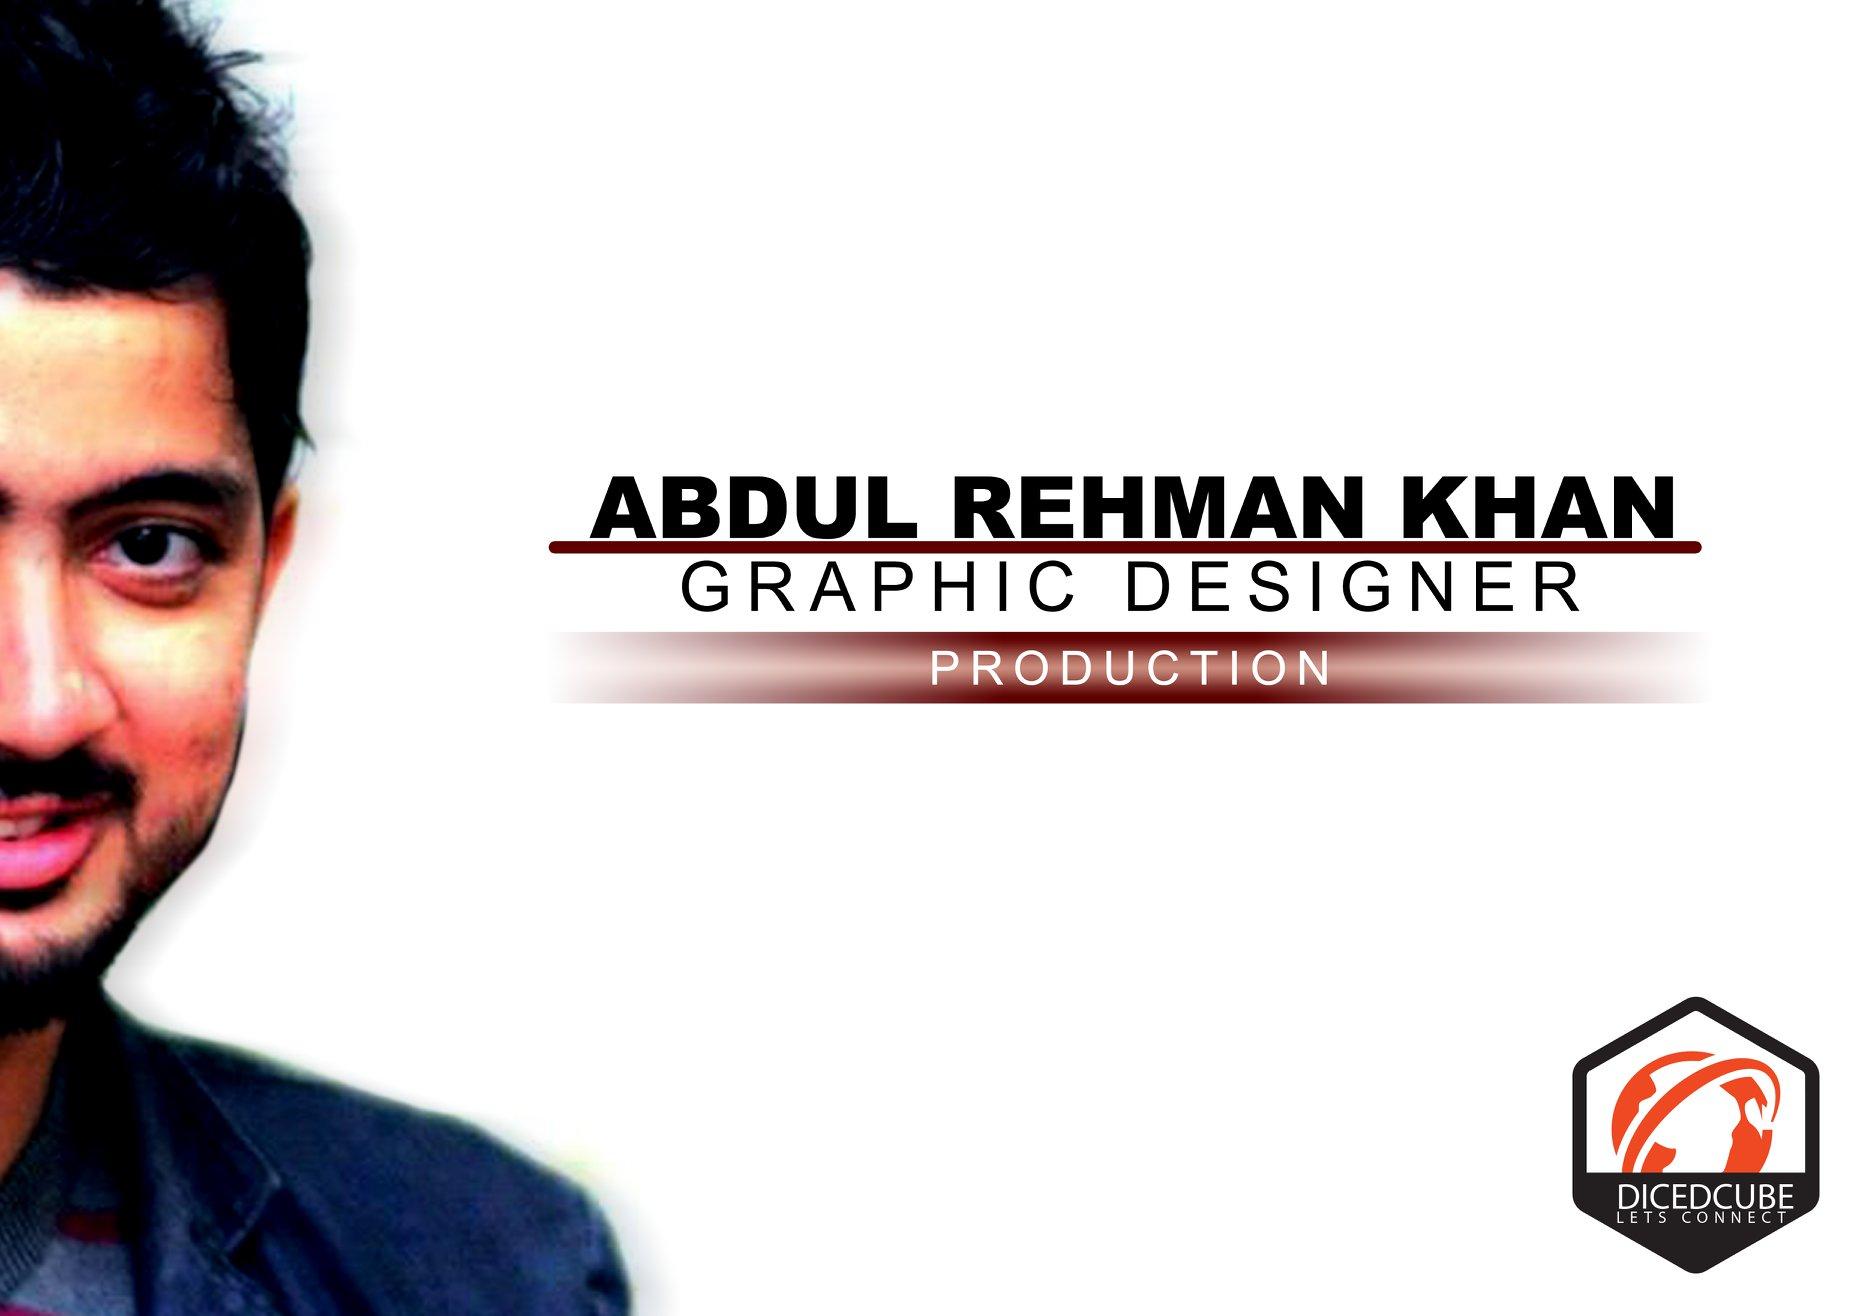 Abdul Rehman Khan 3ds Max, Banner Design, Brochure Design, Business Cards, Creative Design, Account Management, Website Management, Adobe Illustrator, Programming, Search Engine Marketing